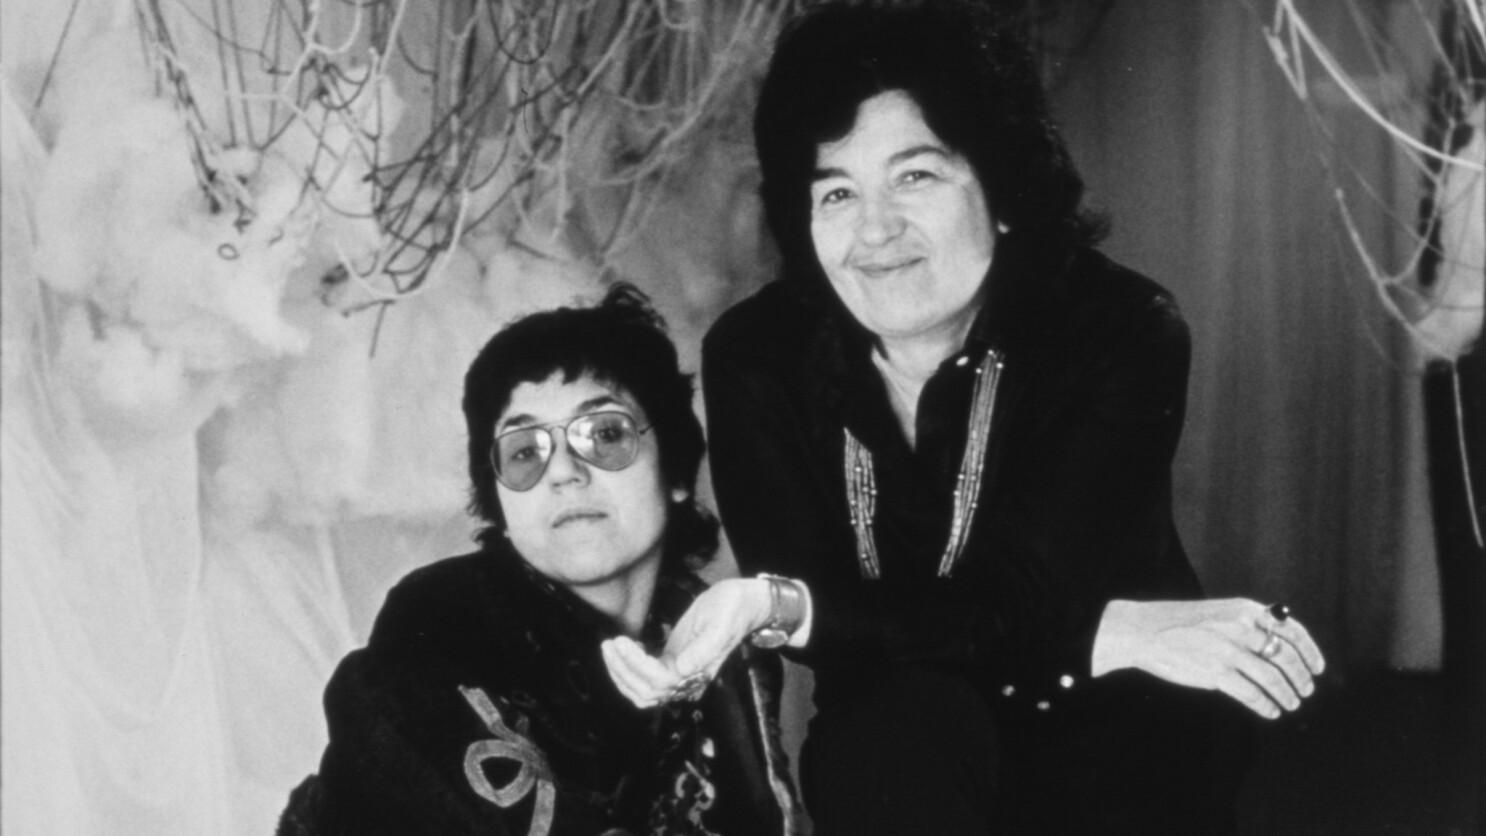 Miriam Schapiro dies at 91